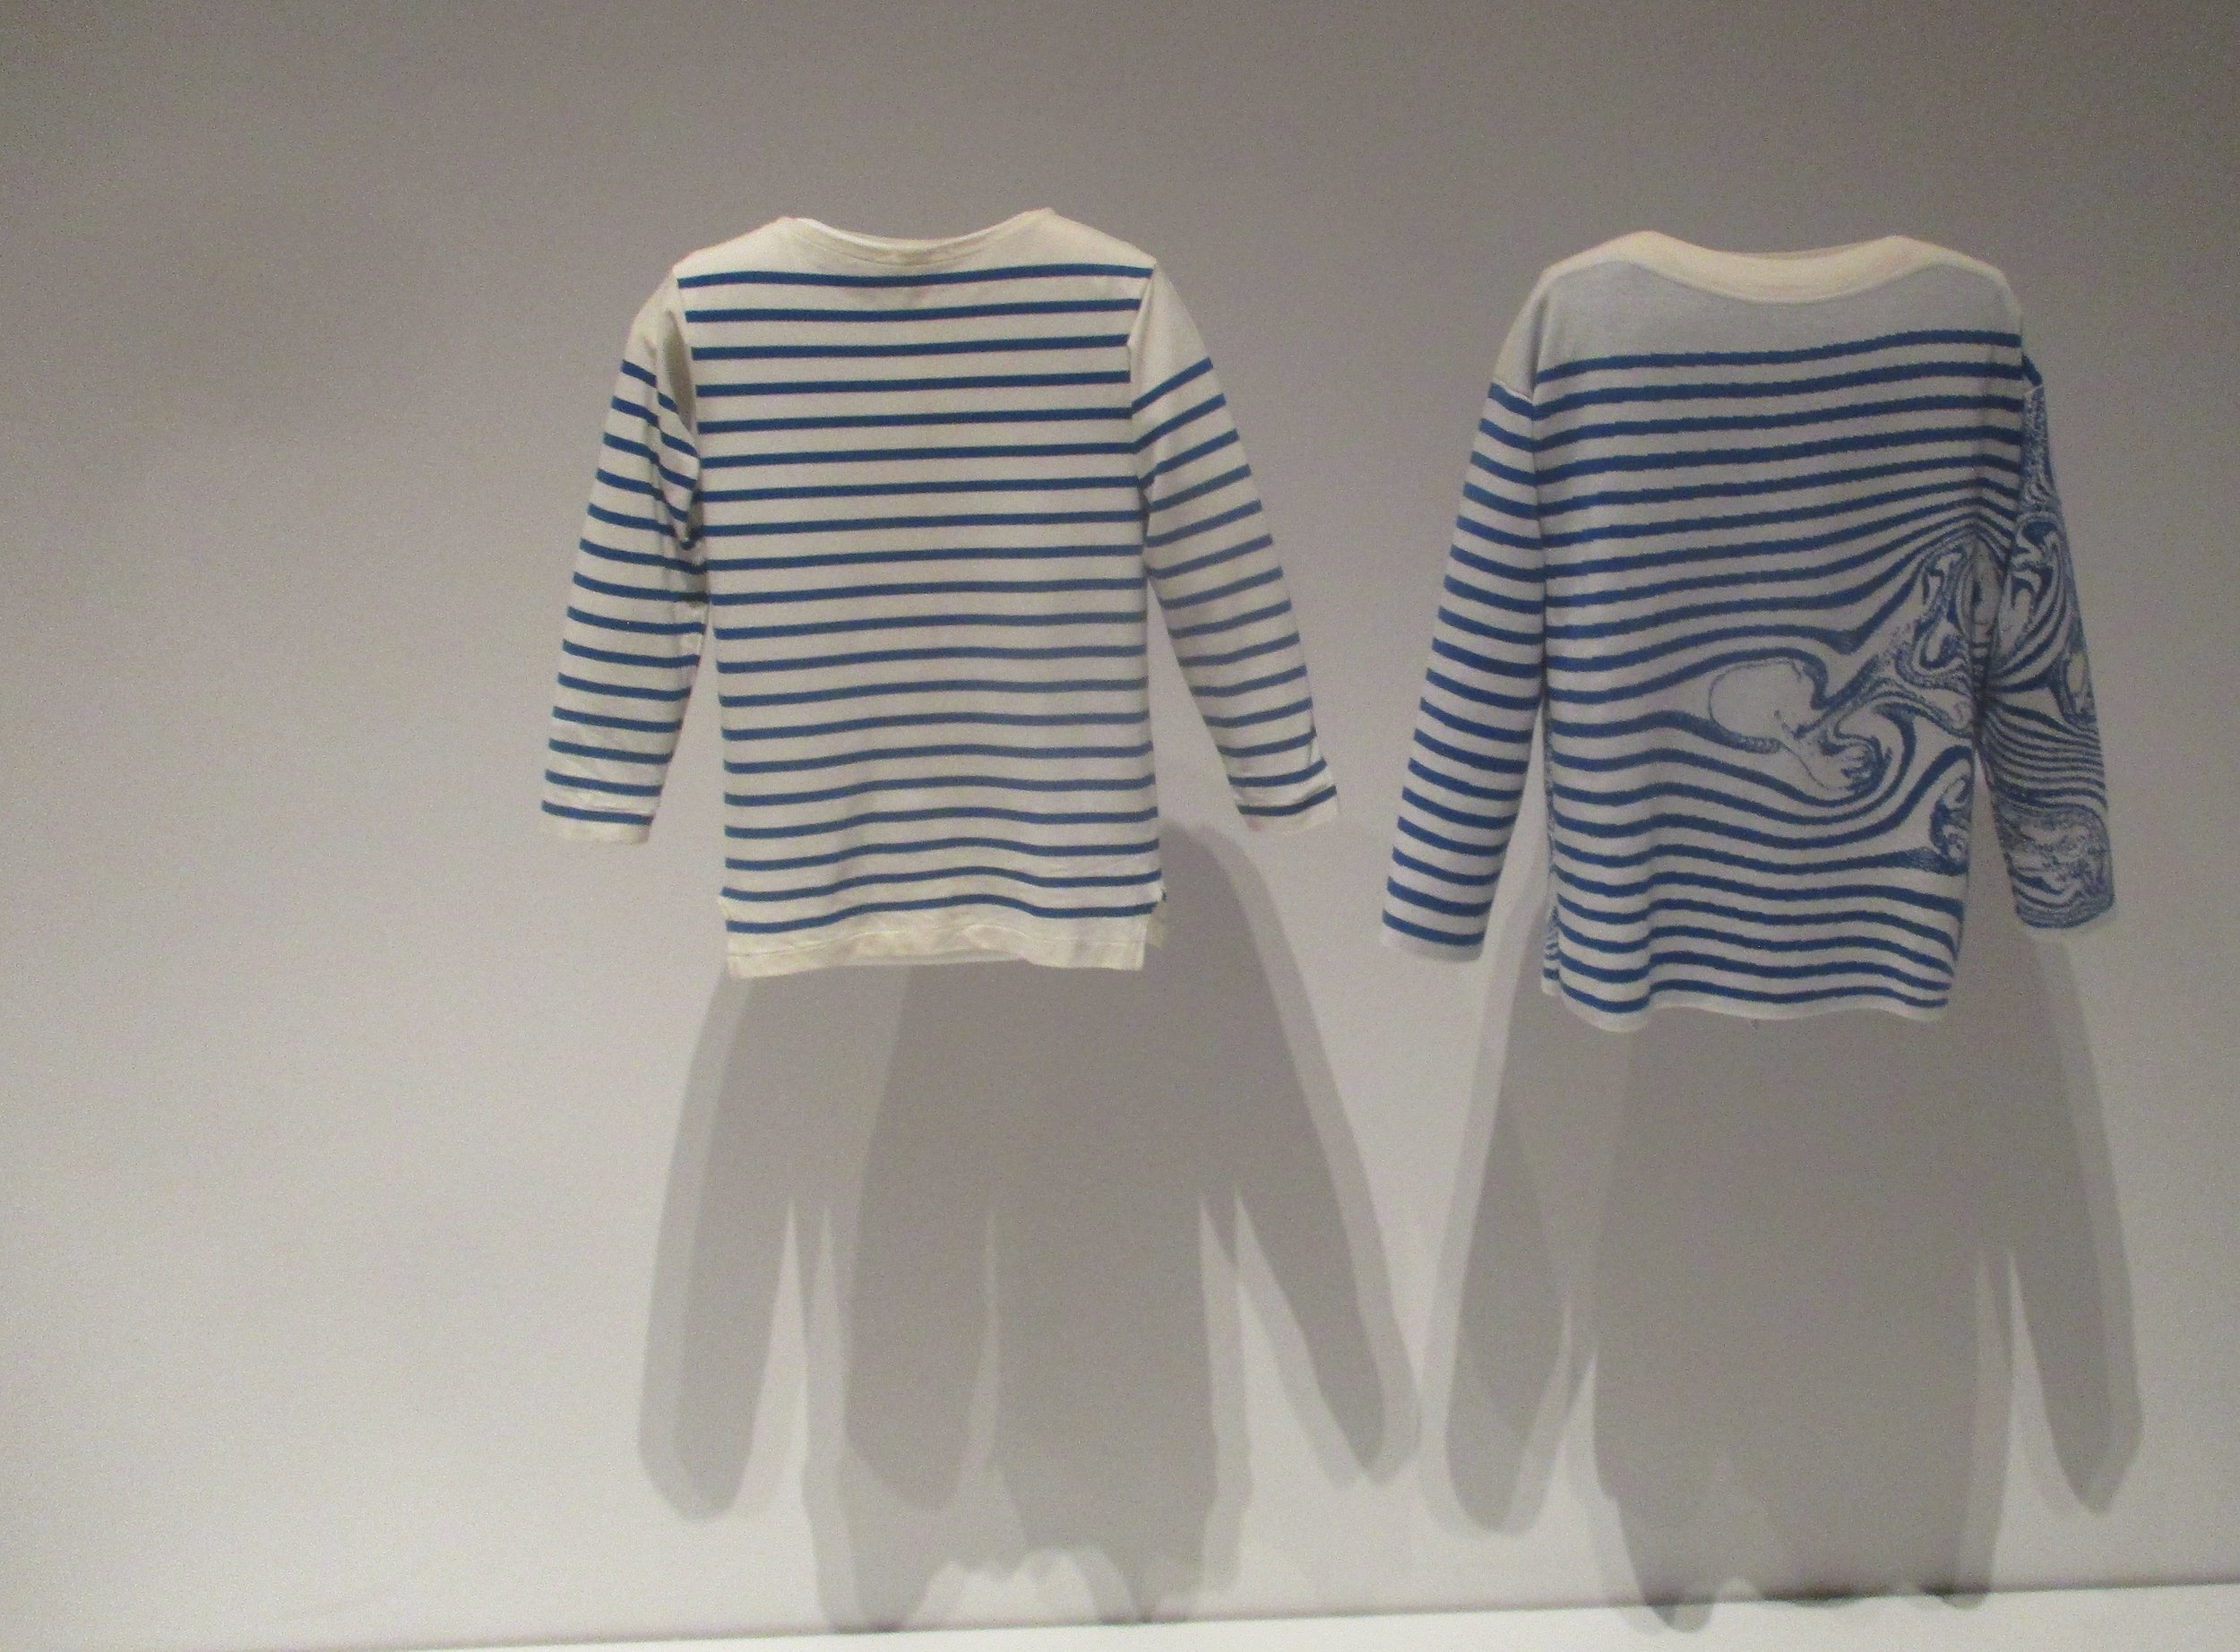 A traditional Breton sweater with a novel new interpretation.